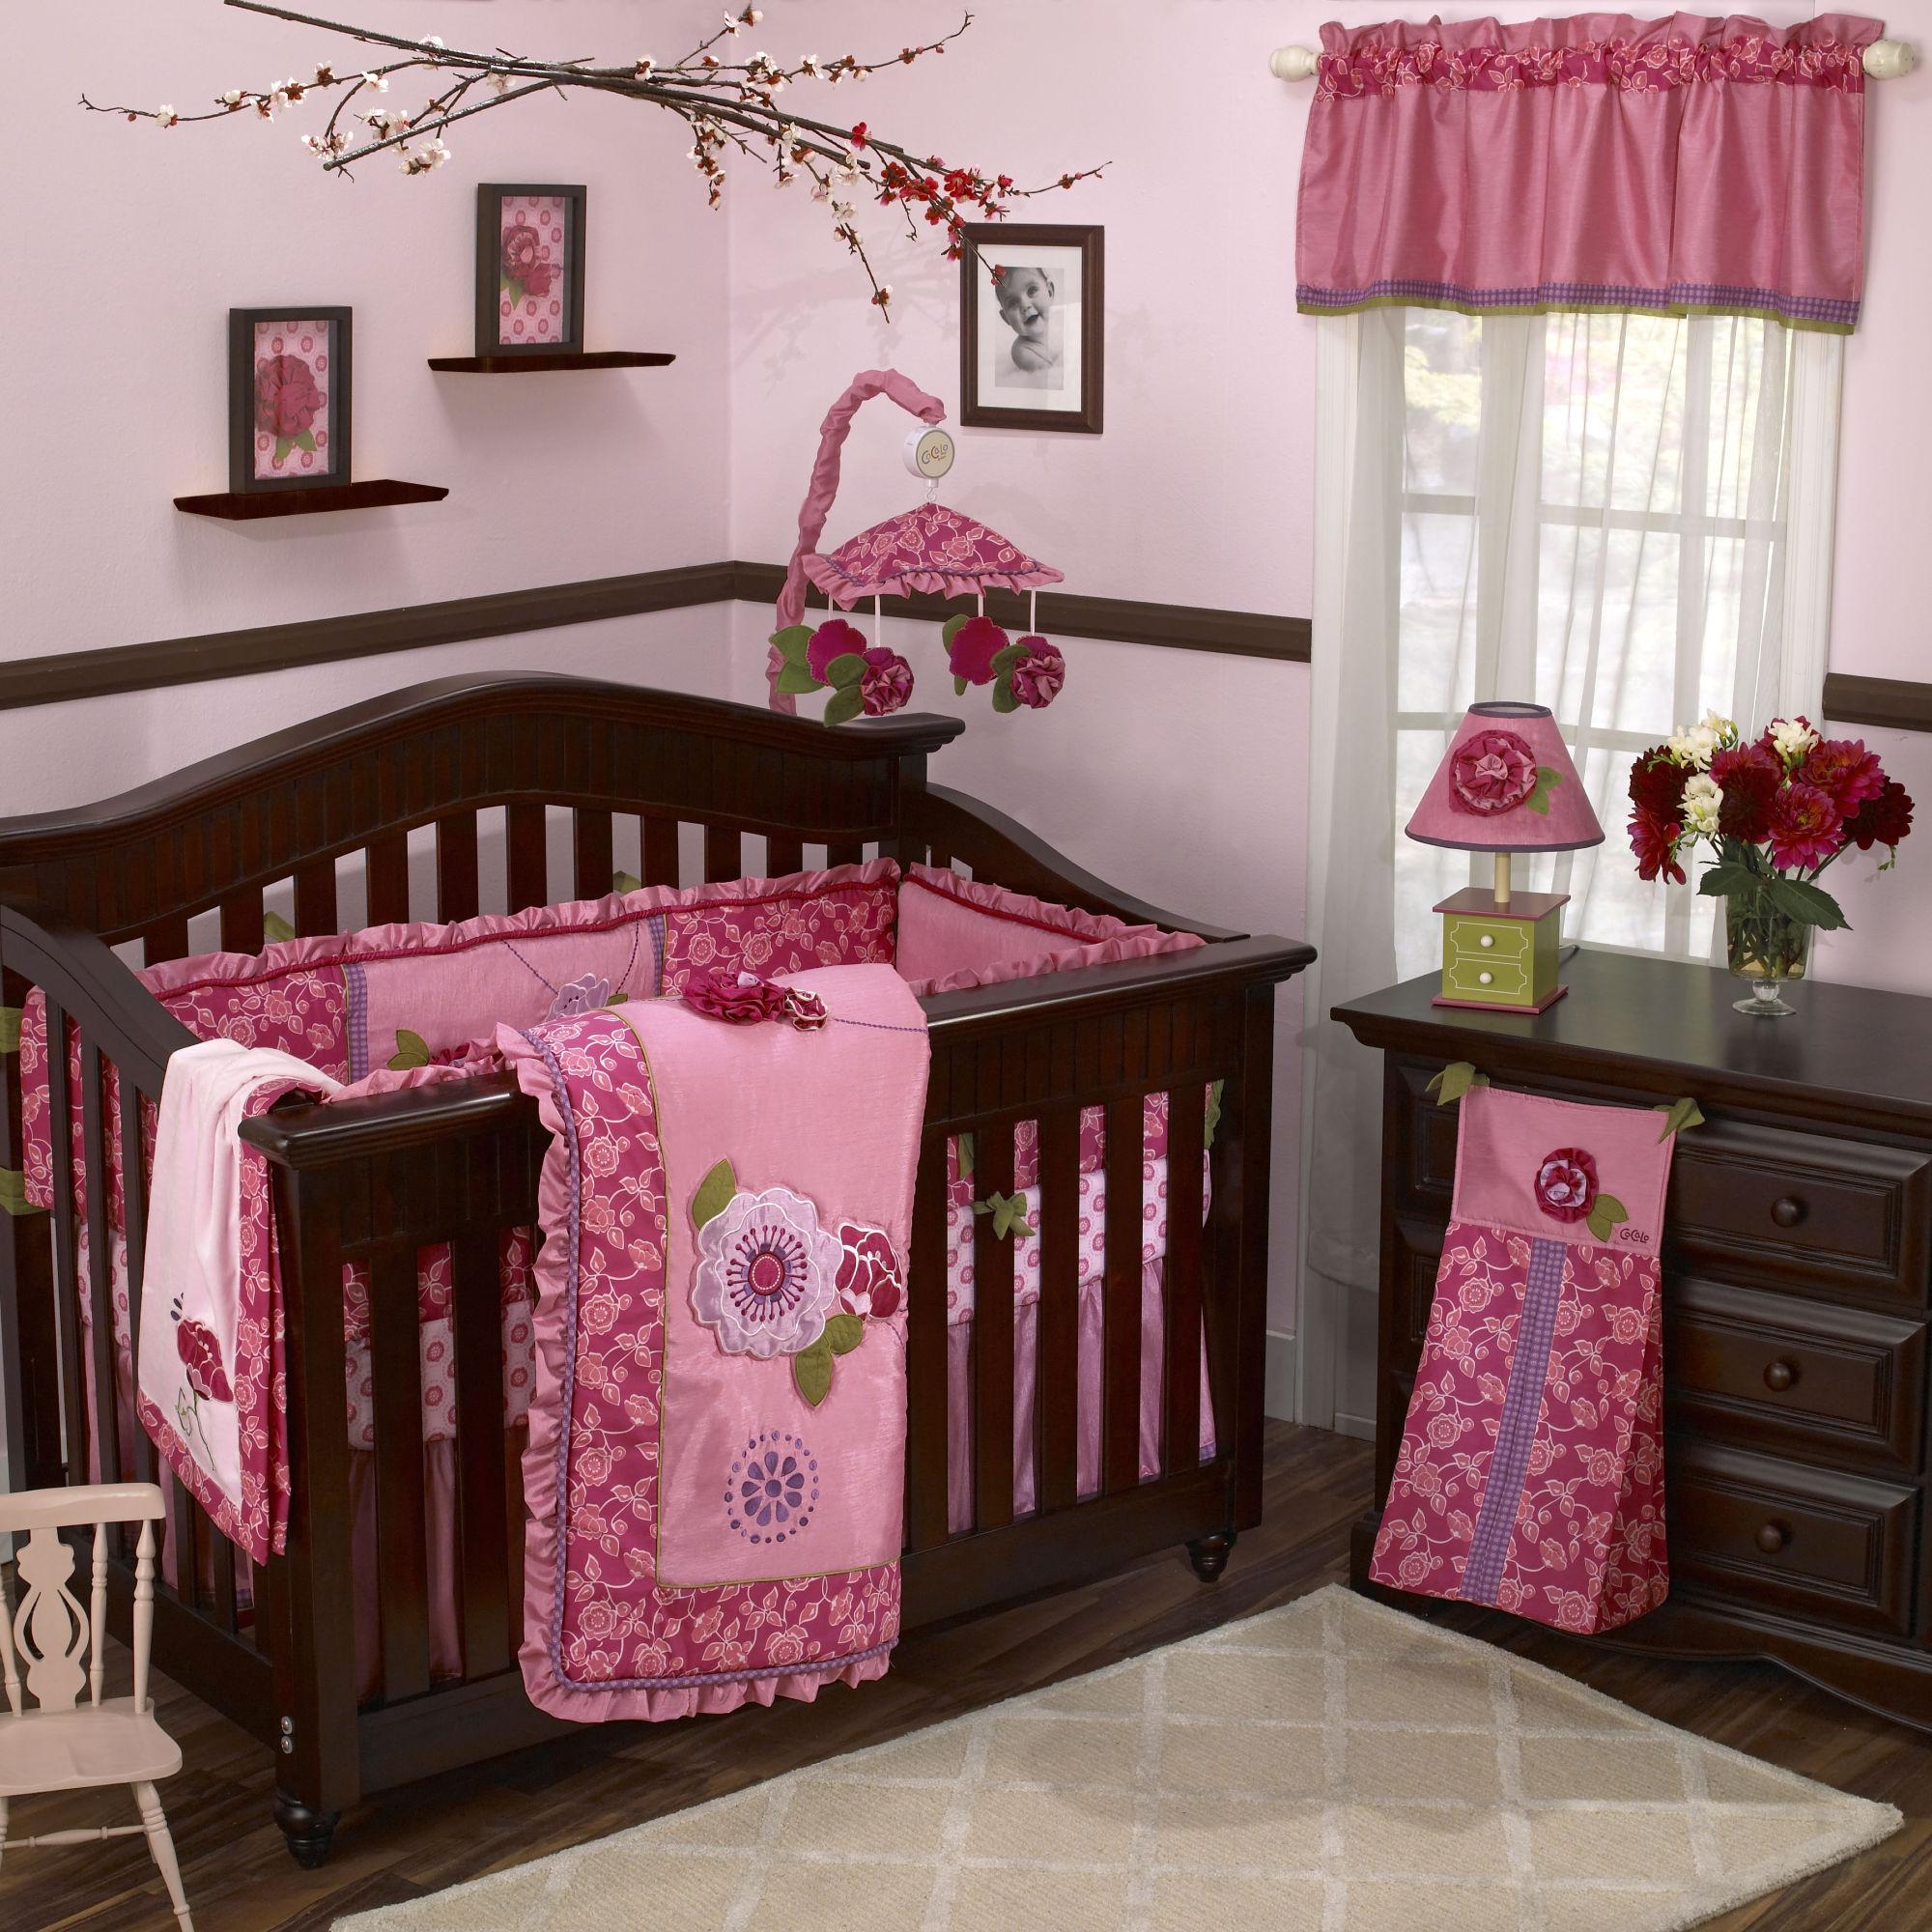 baby girl bedroom ideas photo - 2